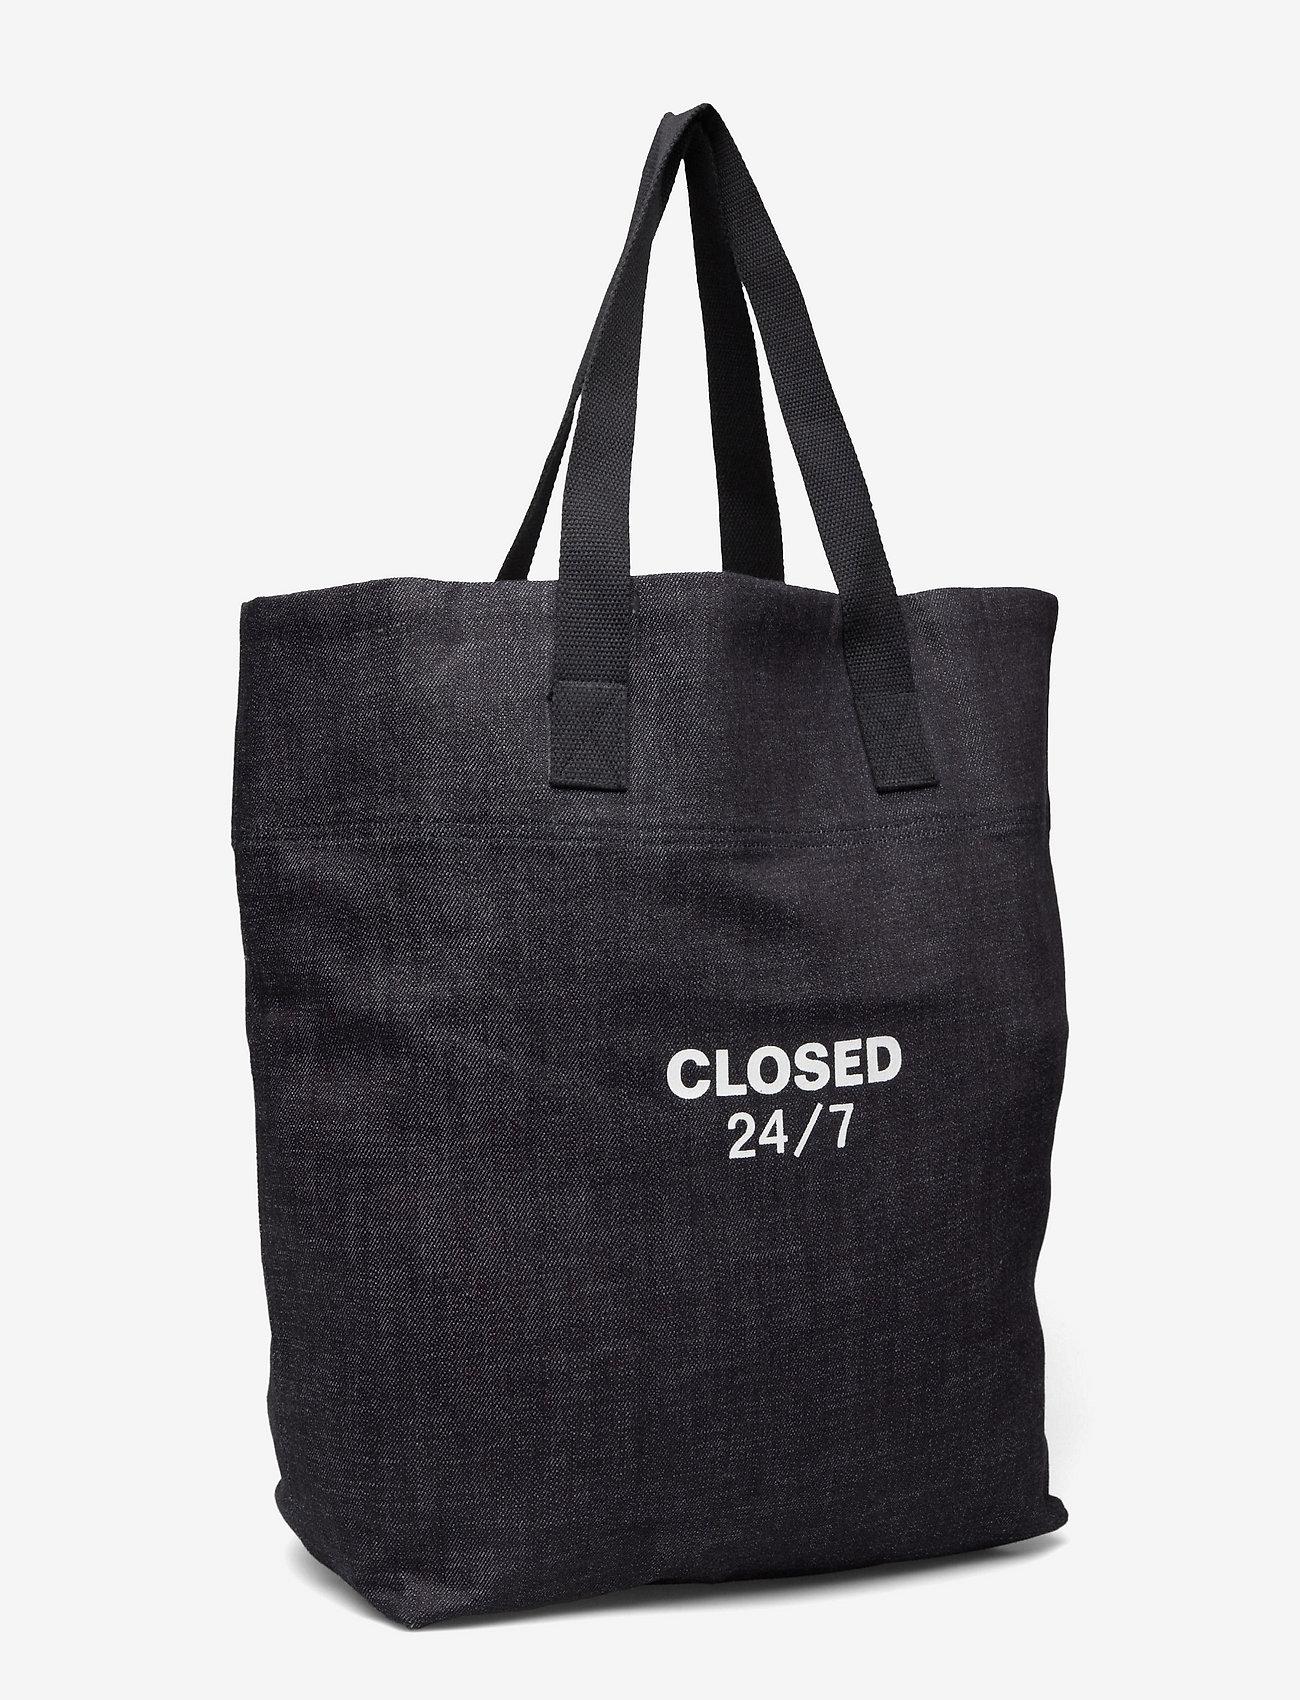 Closed - mens accessories - shoppers - dark blue - 2